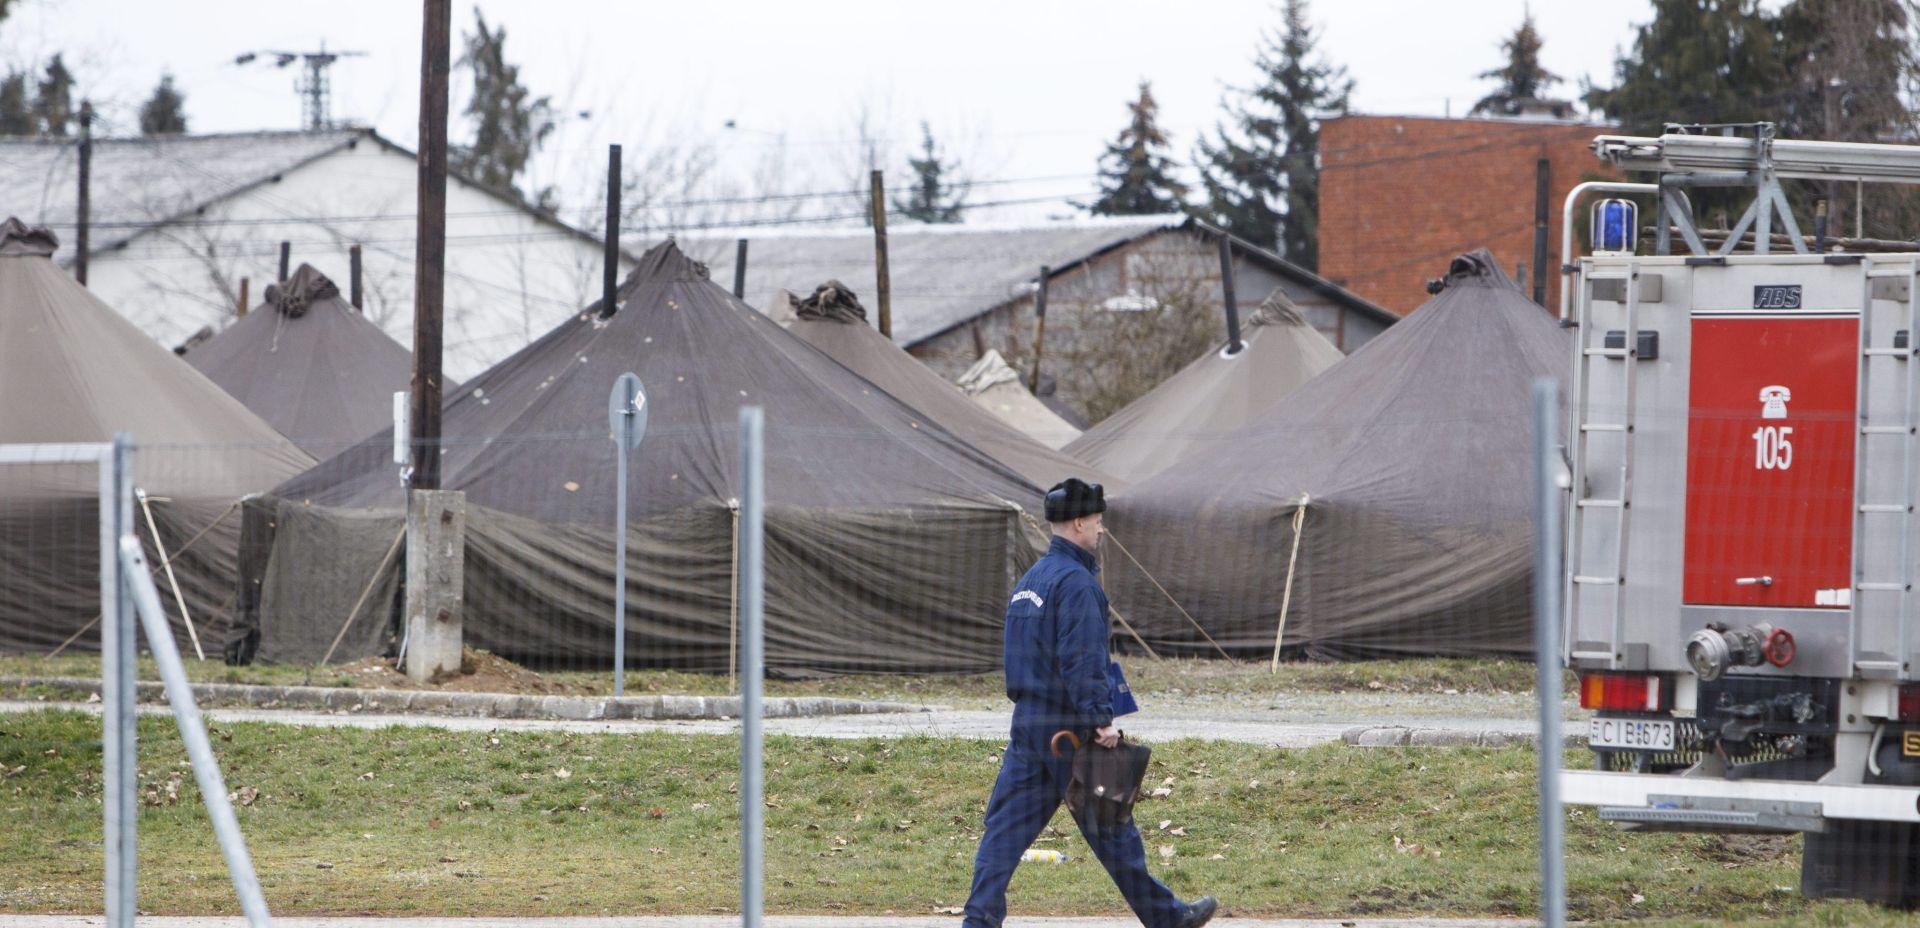 Mađarska vlada: Zatvaranje prihvatnih centara za izbjeglice